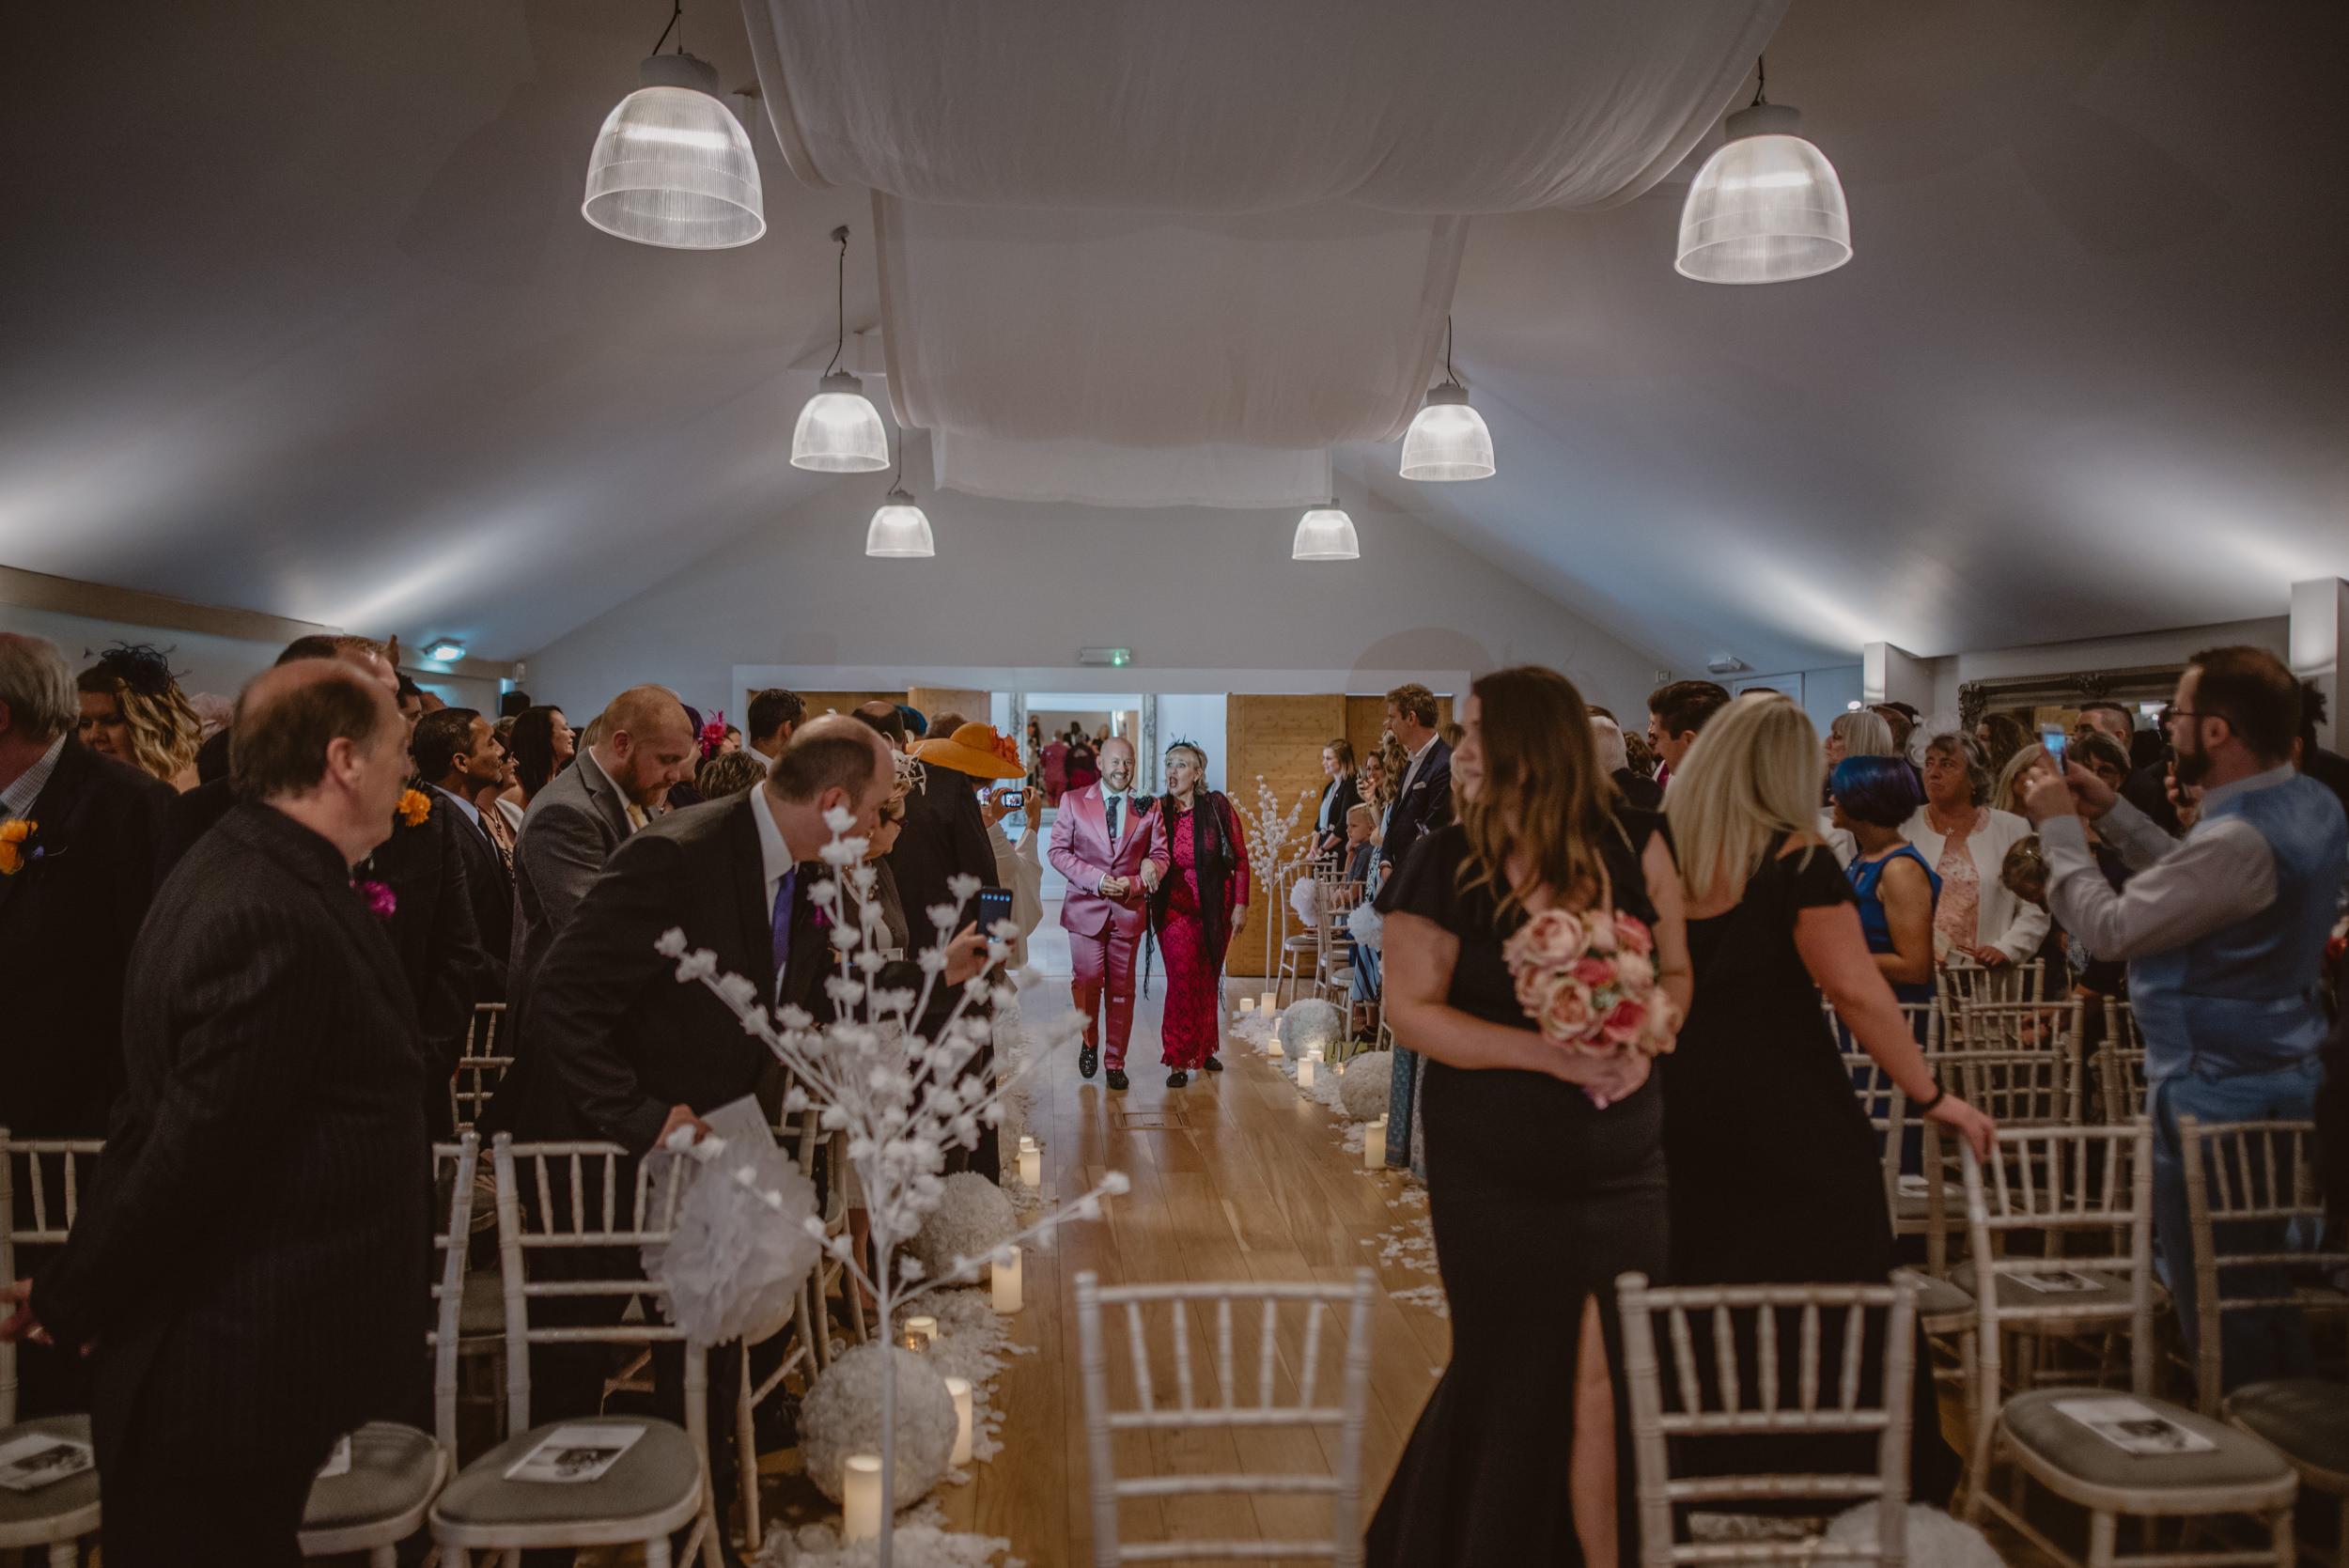 Barry-and-Chaz-wedding-Wasing-Park-Berkshire-Manu-Mendoza-Wedding-Photography-168.jpg